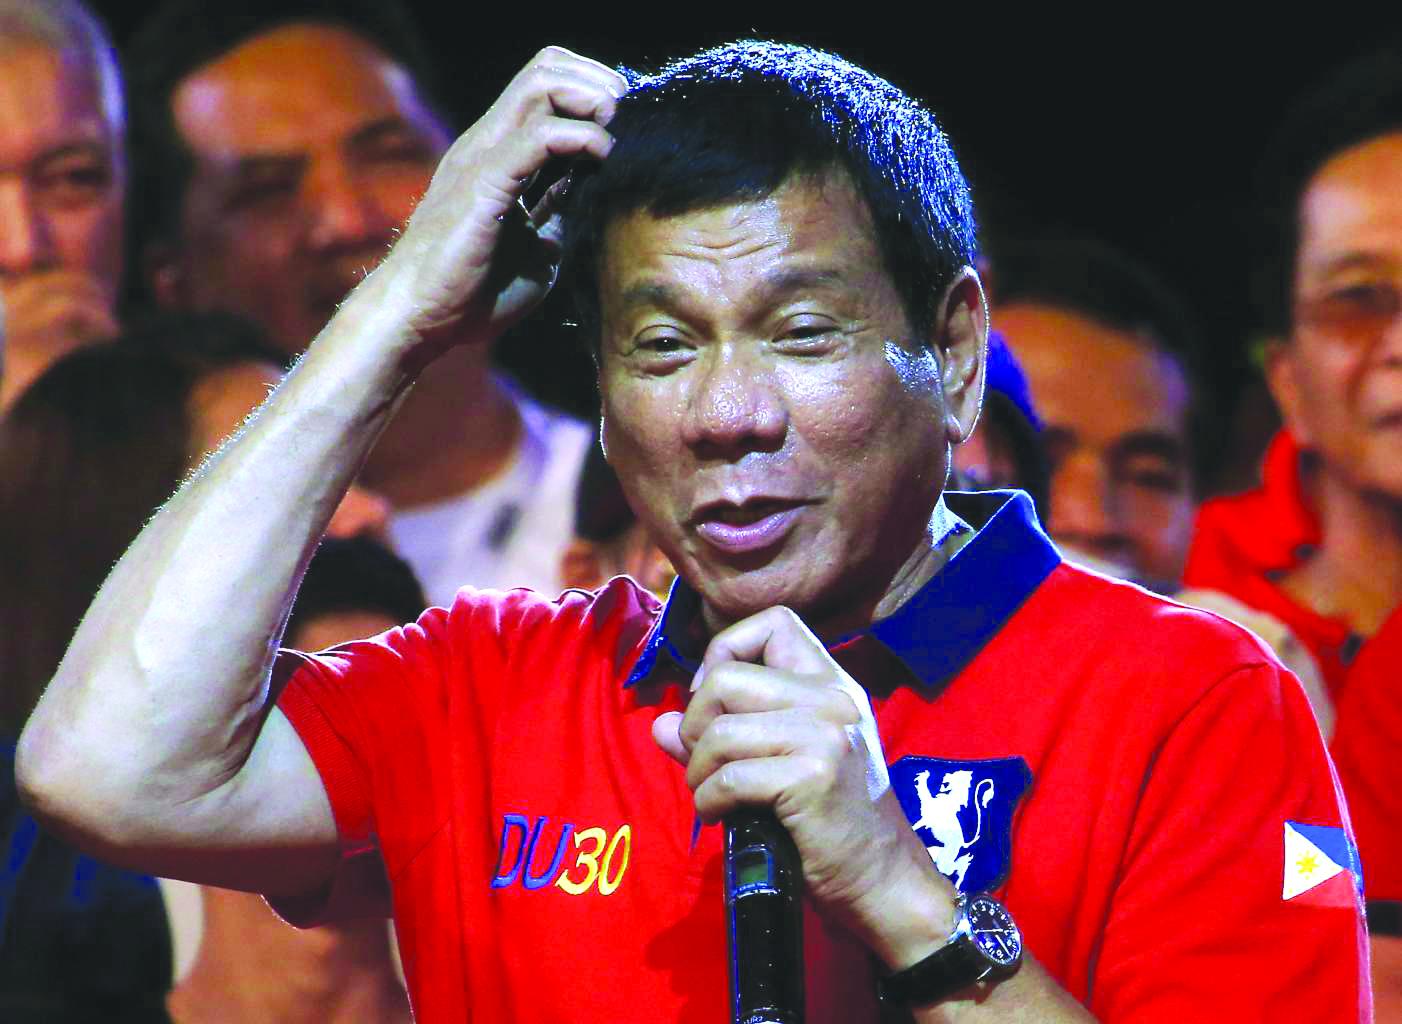 Duterte blames 'beautiful women' for rape cases